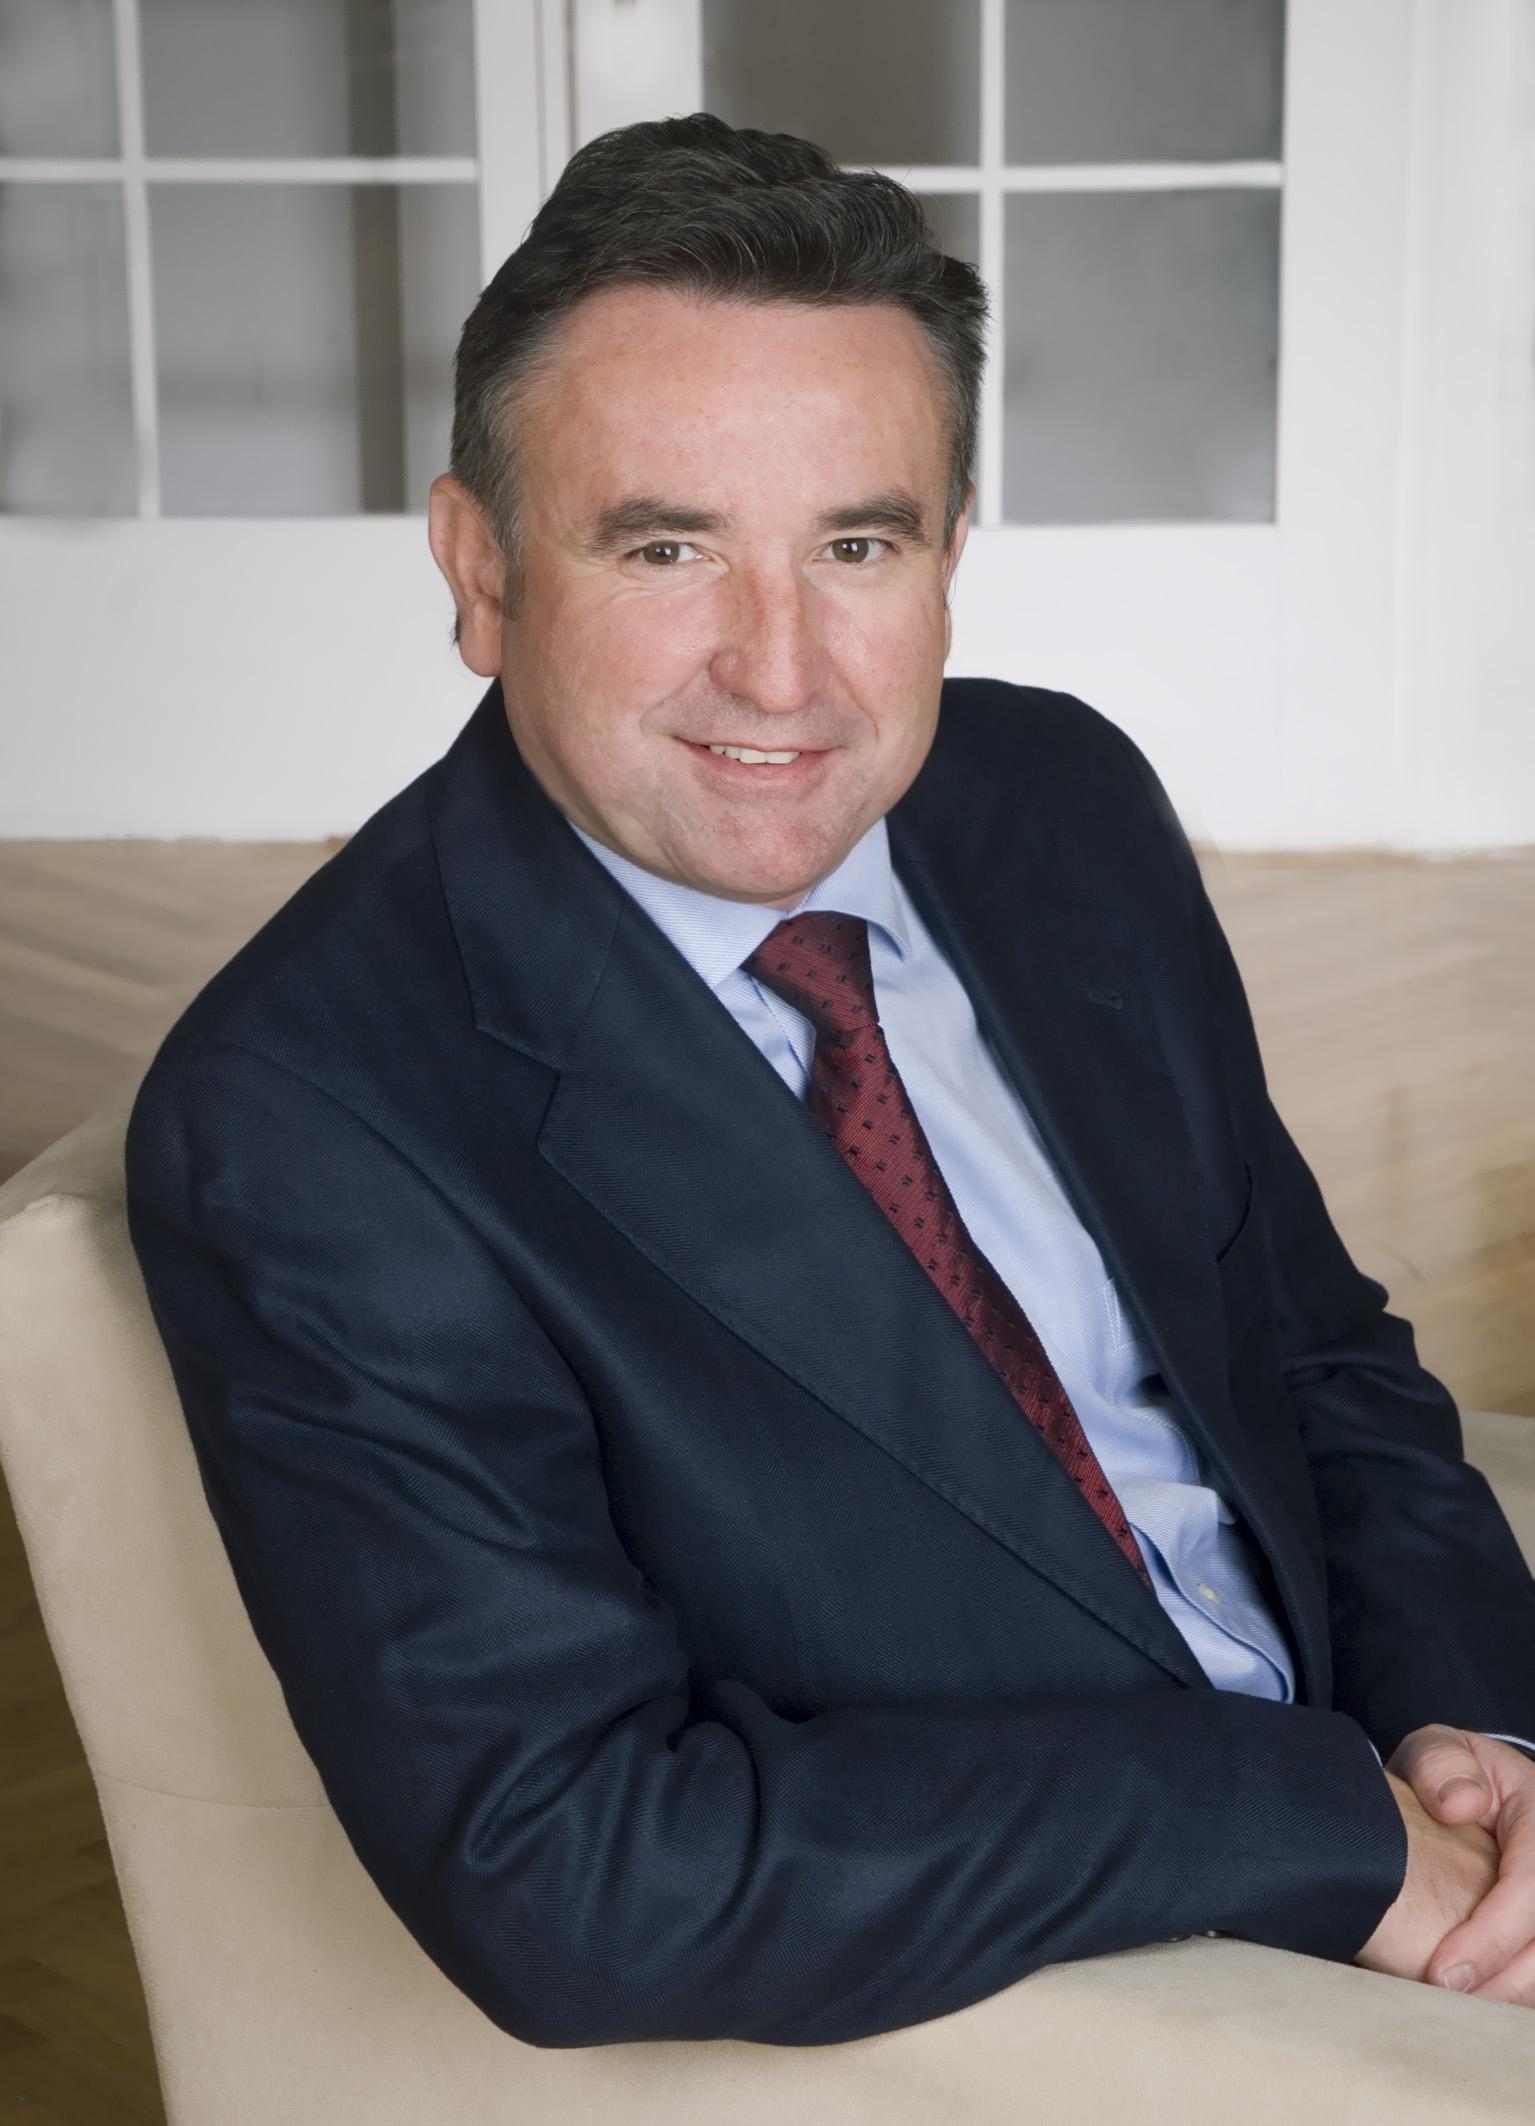 Ing. Georg Kühn